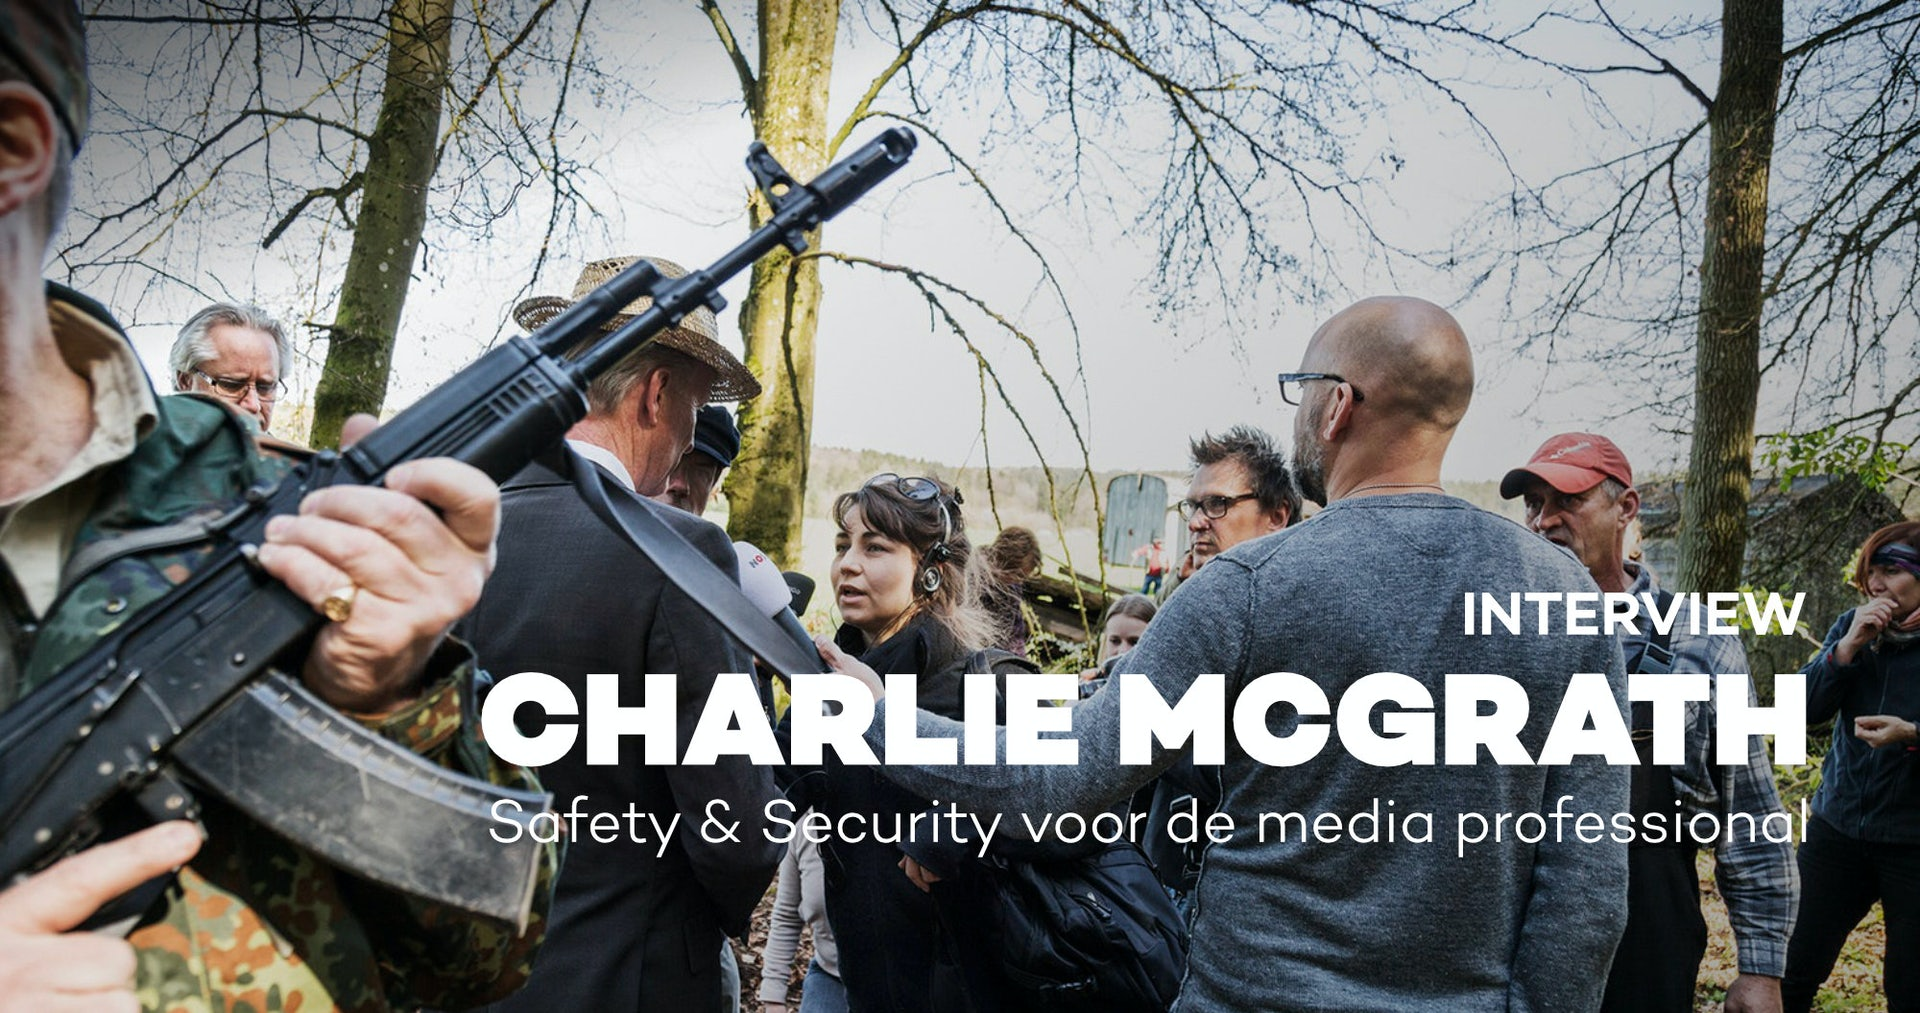 Safety & Security voor de media professional